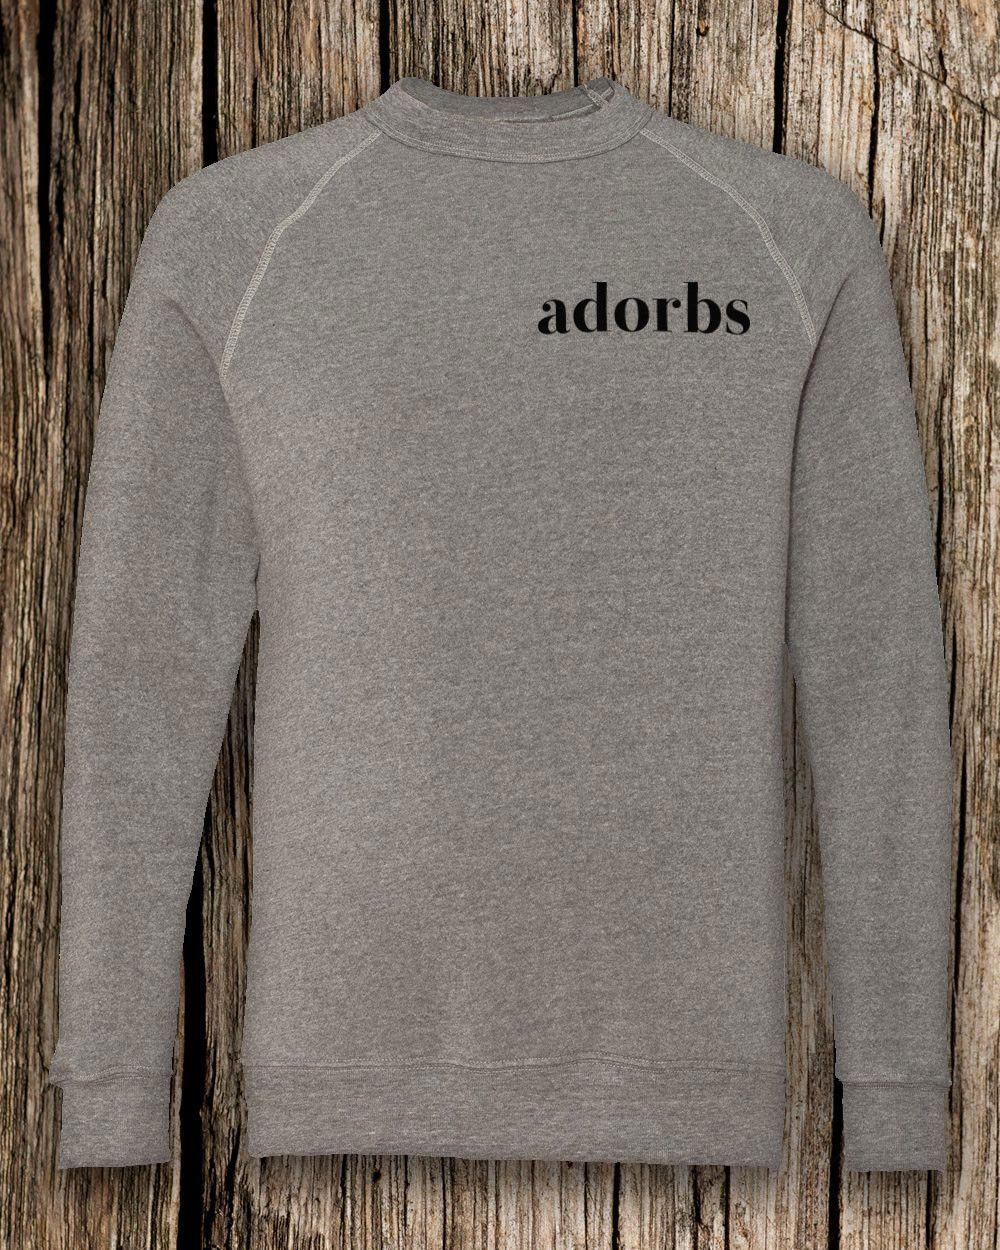 adorbs Eco-Fleece Crewneck Sweatshirt